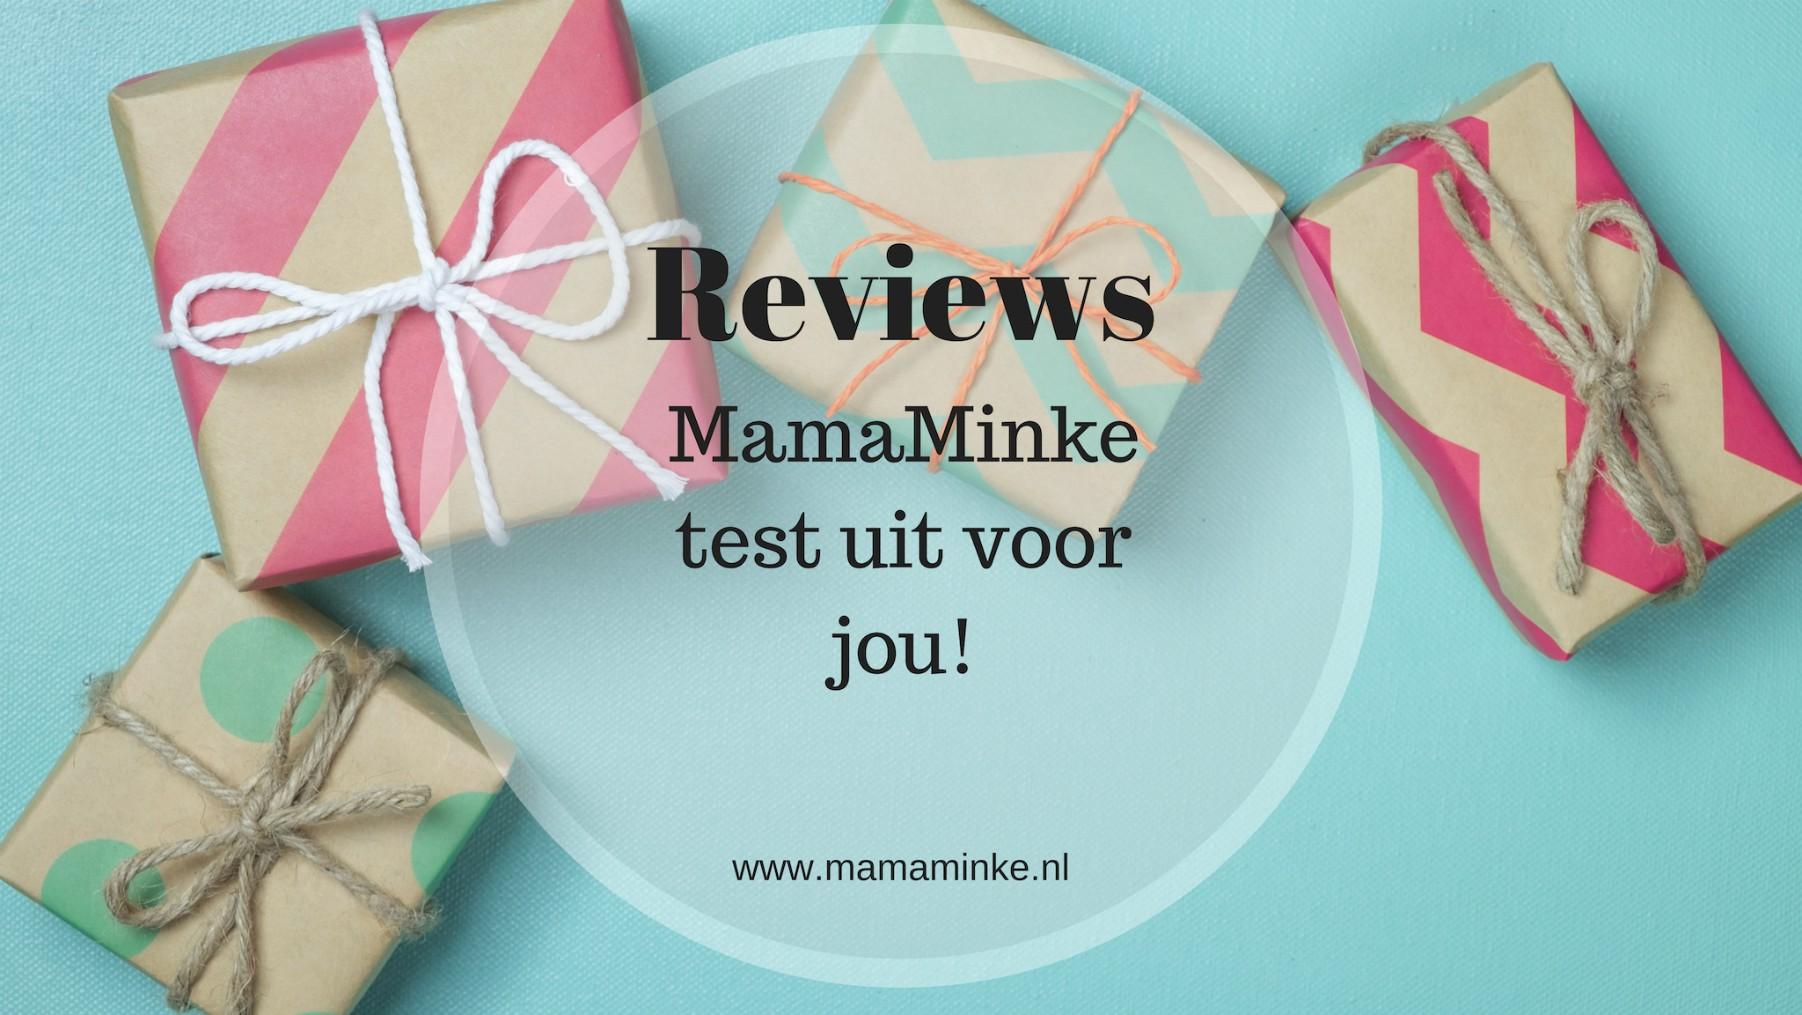 Deze week veel (speelgoed) reviews op mamaminke.nl